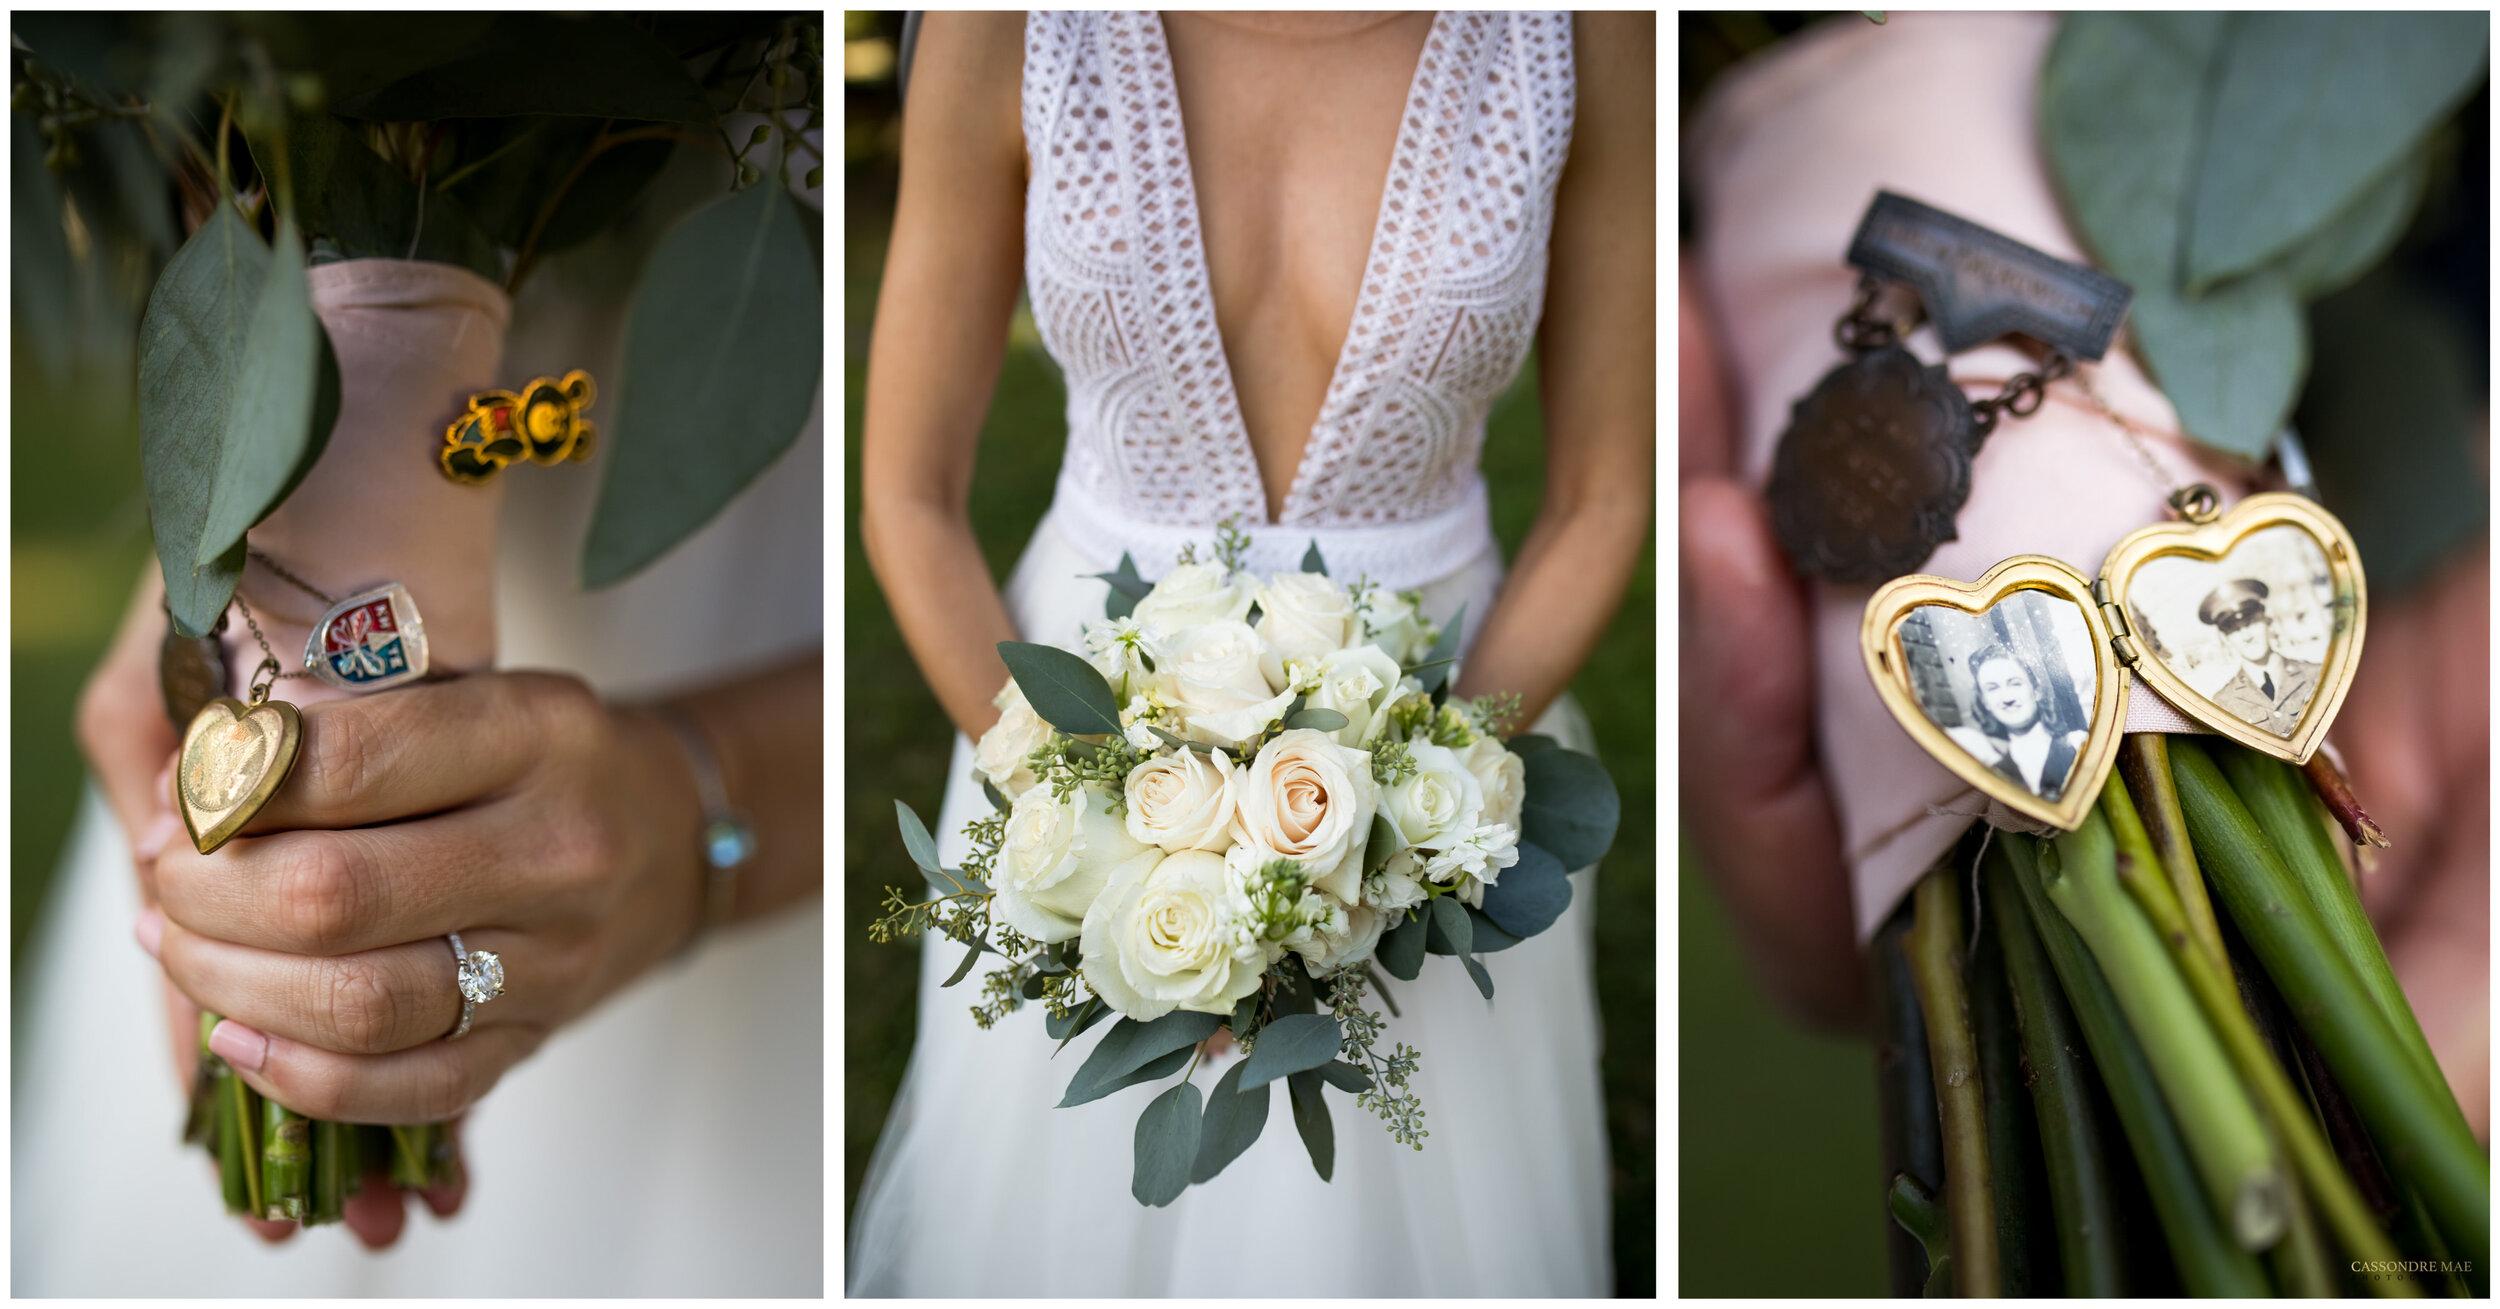 Cassondre Mae Photography Briarcliff Manor Wedding Photographer 1.jpg